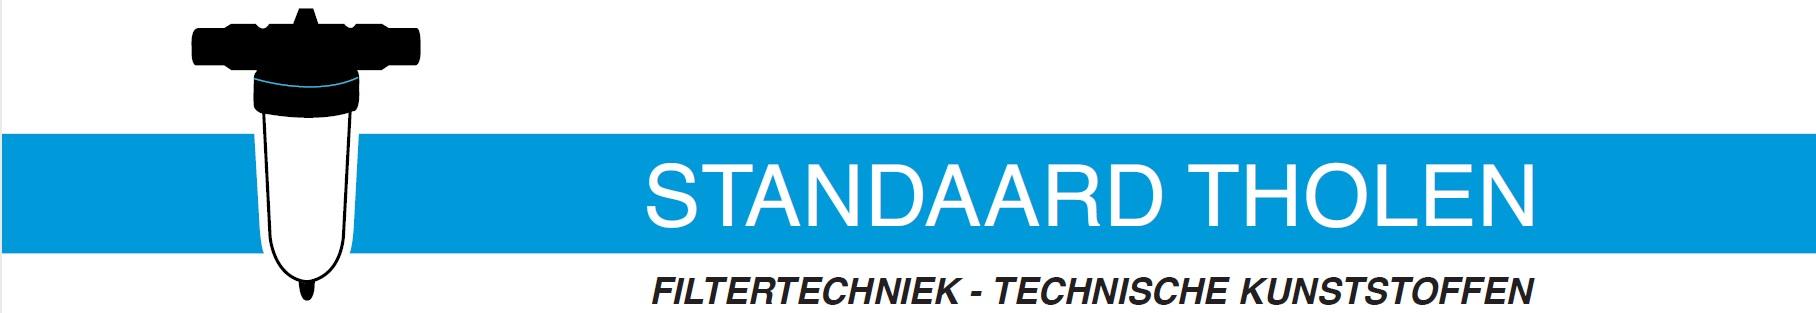 logo standaard